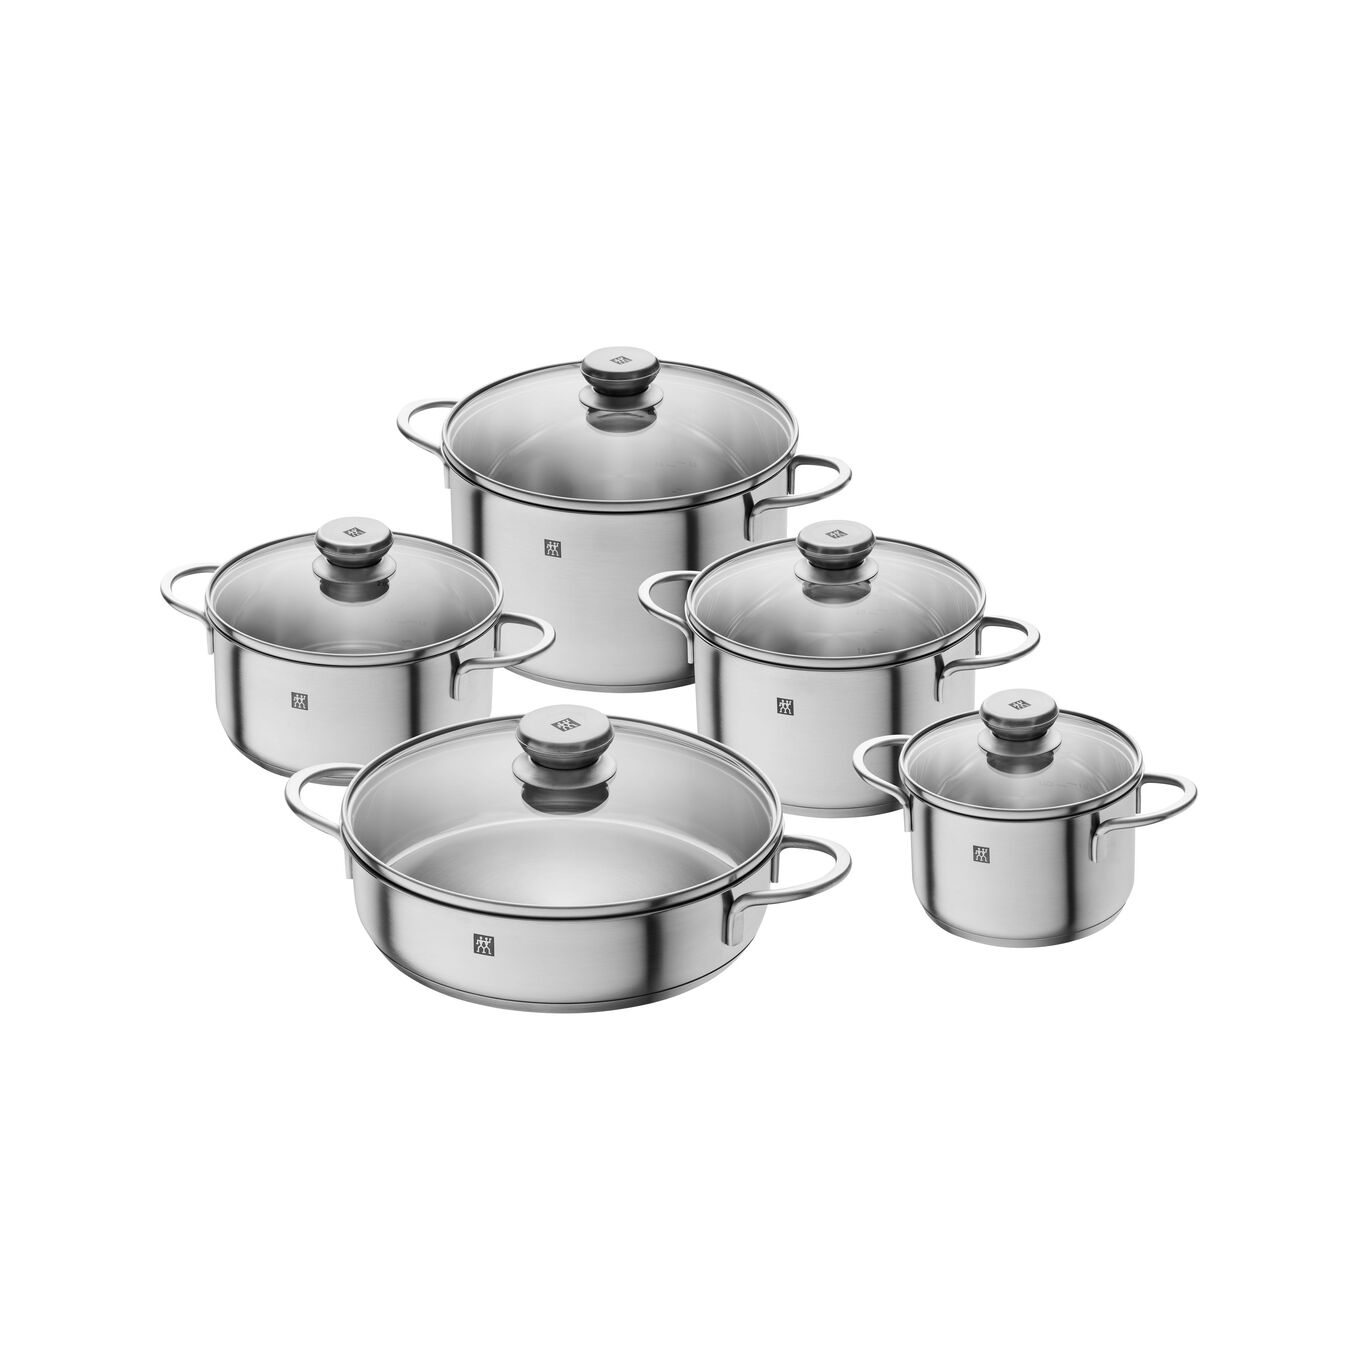 Tencere Seti | 18/10 Paslanmaz Çelik | 5-adet,,large 1